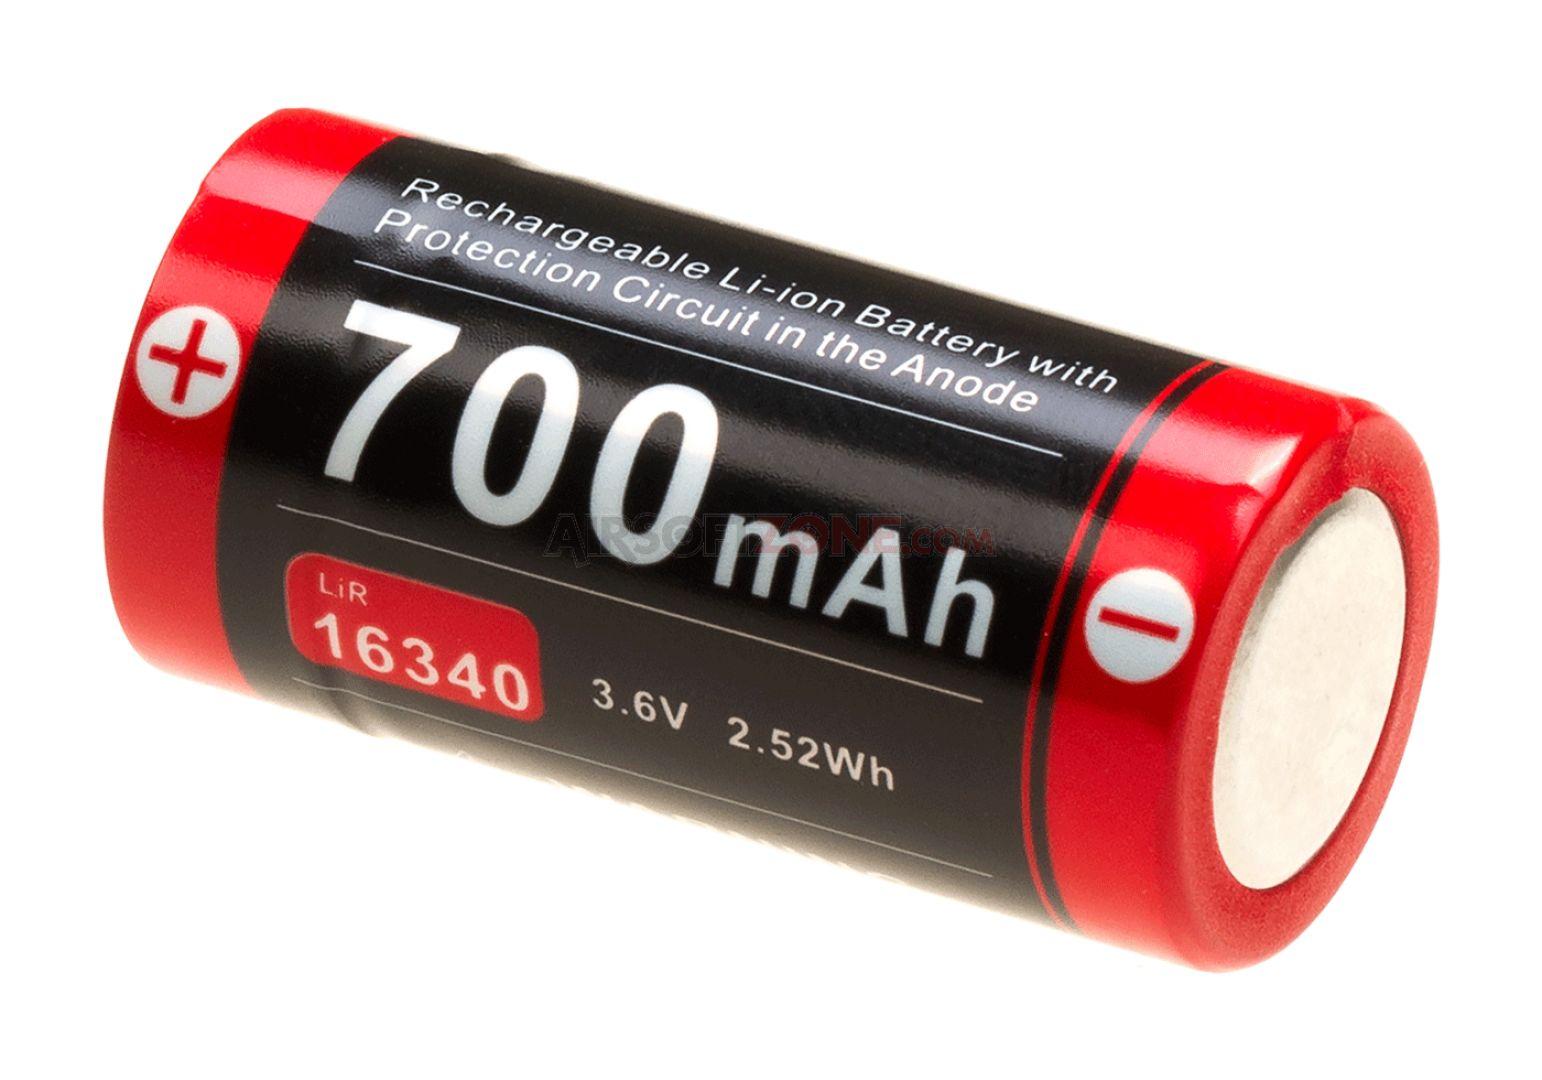 Batteria ricaricabile Li-on 16340